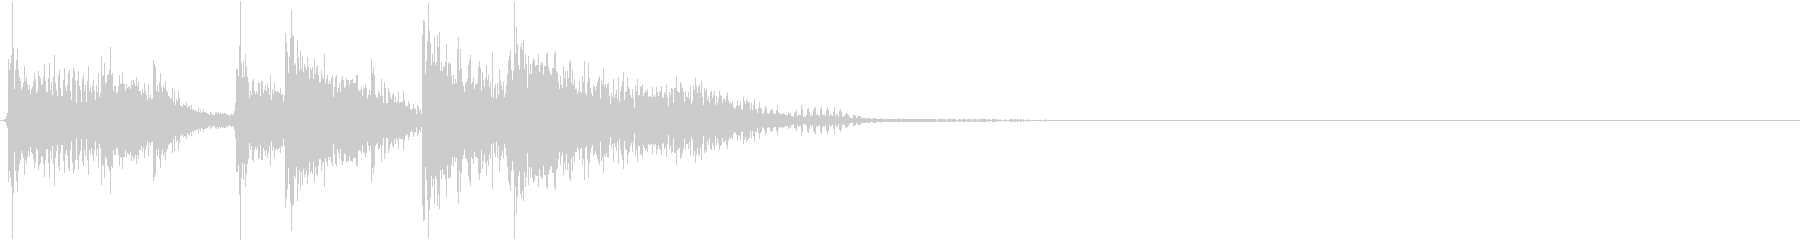 JUMPIN 'SEGUE 2、フ...の未再生の波形